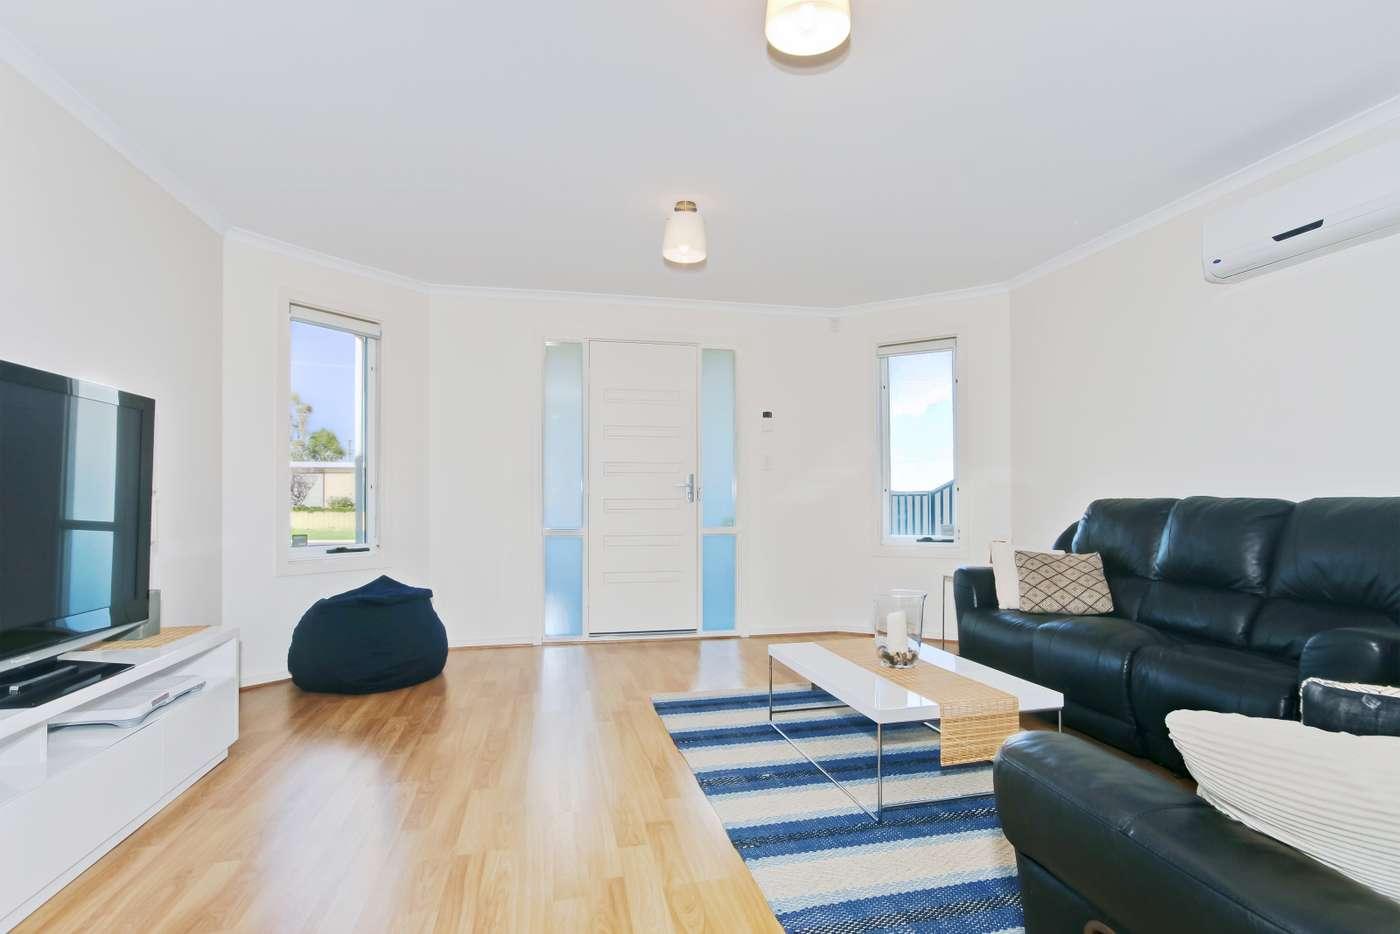 Sixth view of Homely house listing, 1 Butterworth Road, Aldinga Beach SA 5173